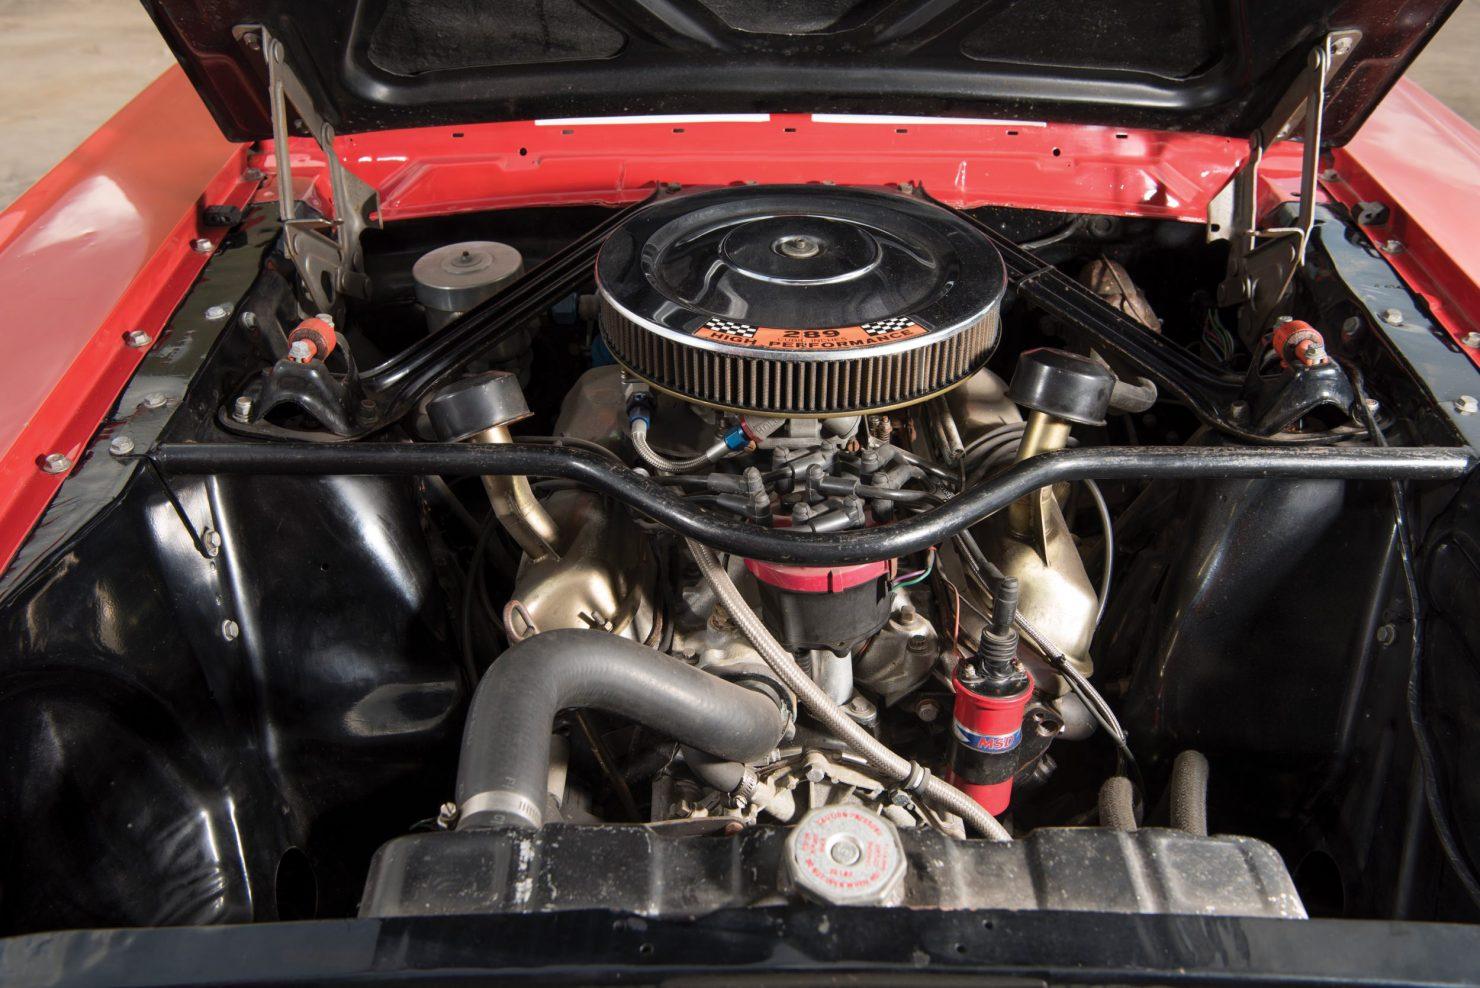 shelby gt350 race car 3 1480x988 - 1966 Shelby GT350 - Period SCCA Race Car